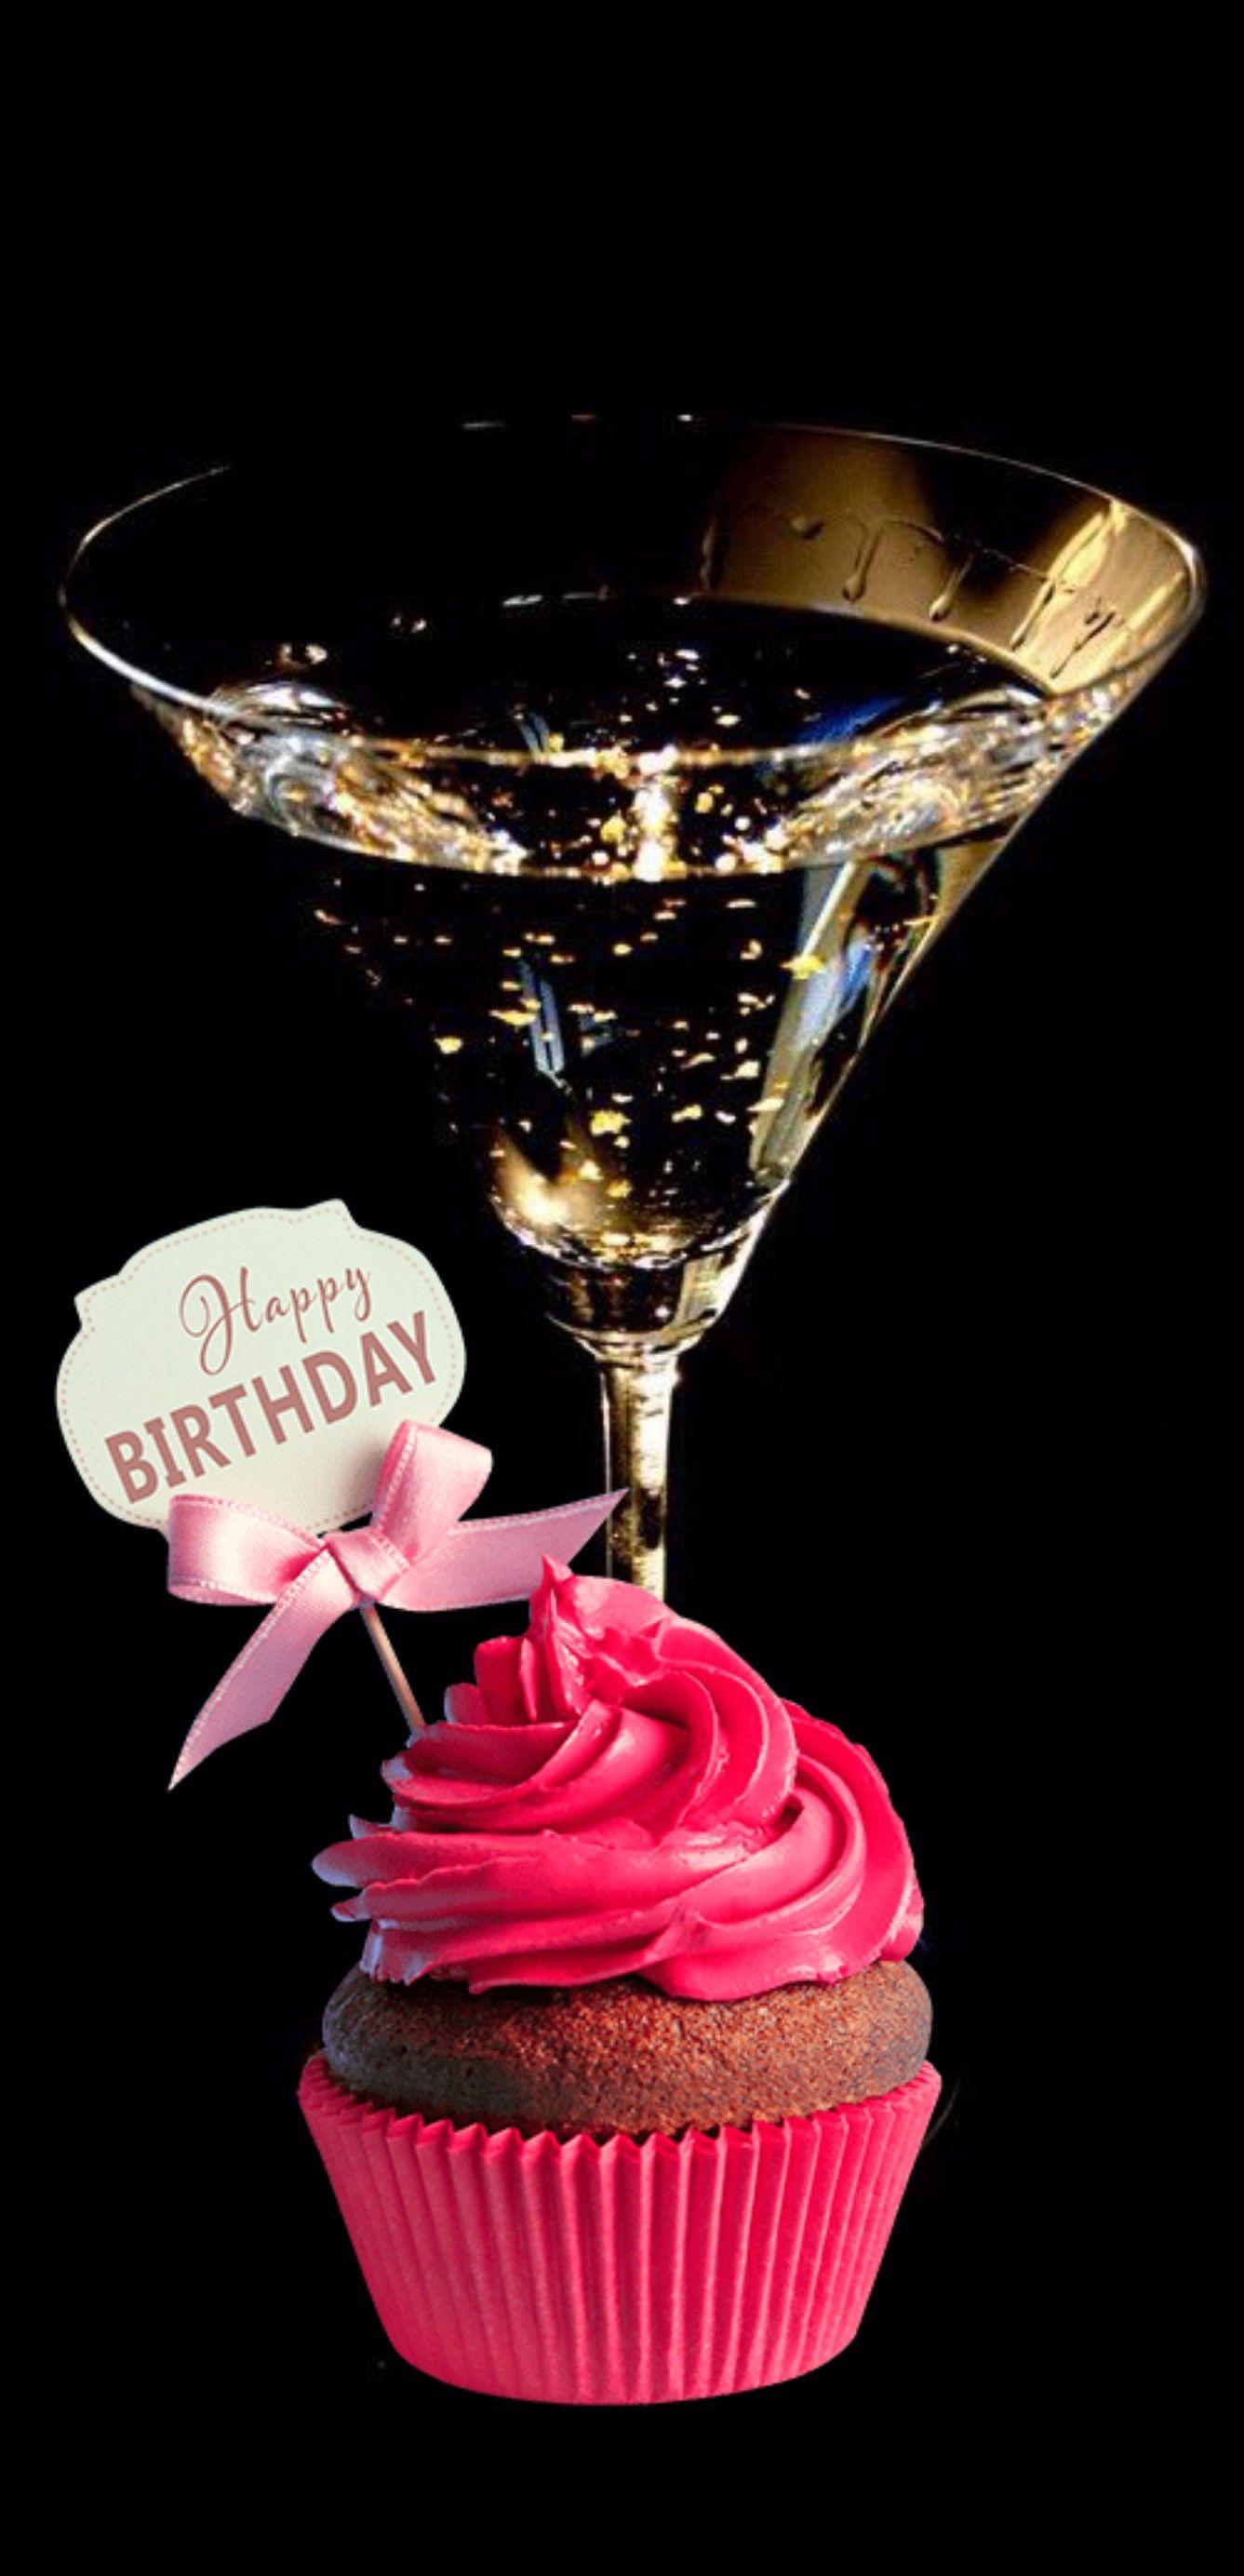 Happy Birthday Cupcake And Champagne Happy Birthday Wishes Happy